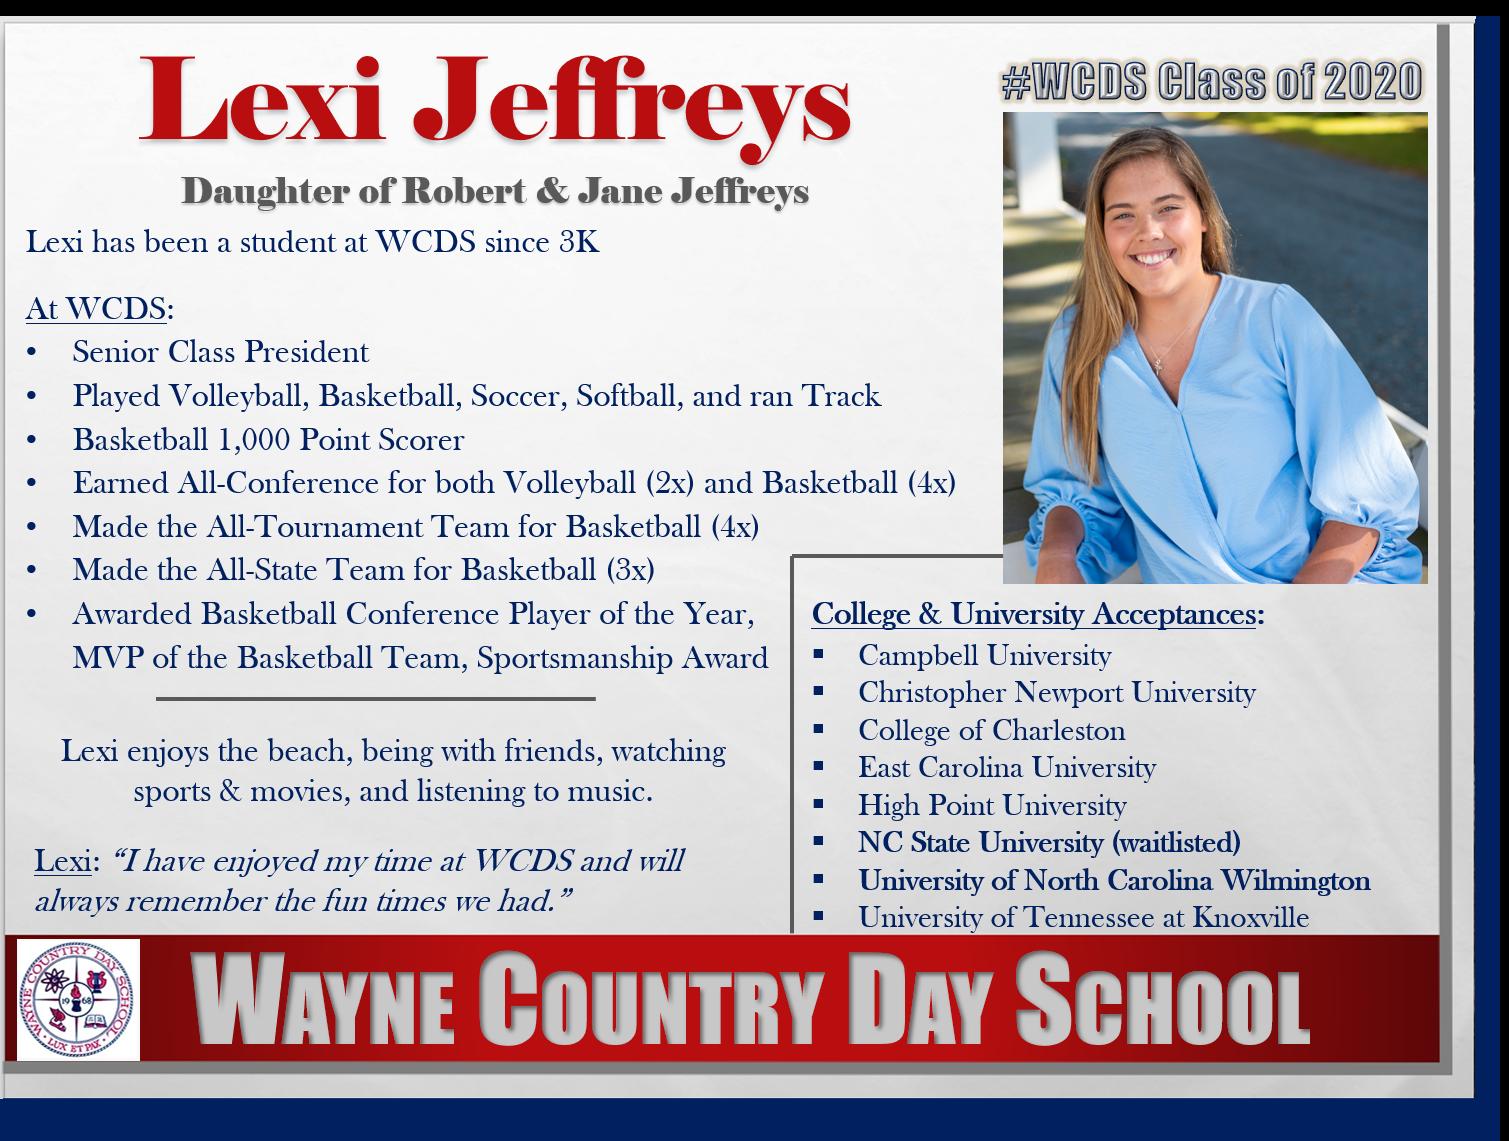 Lexi Jeffreys Profile